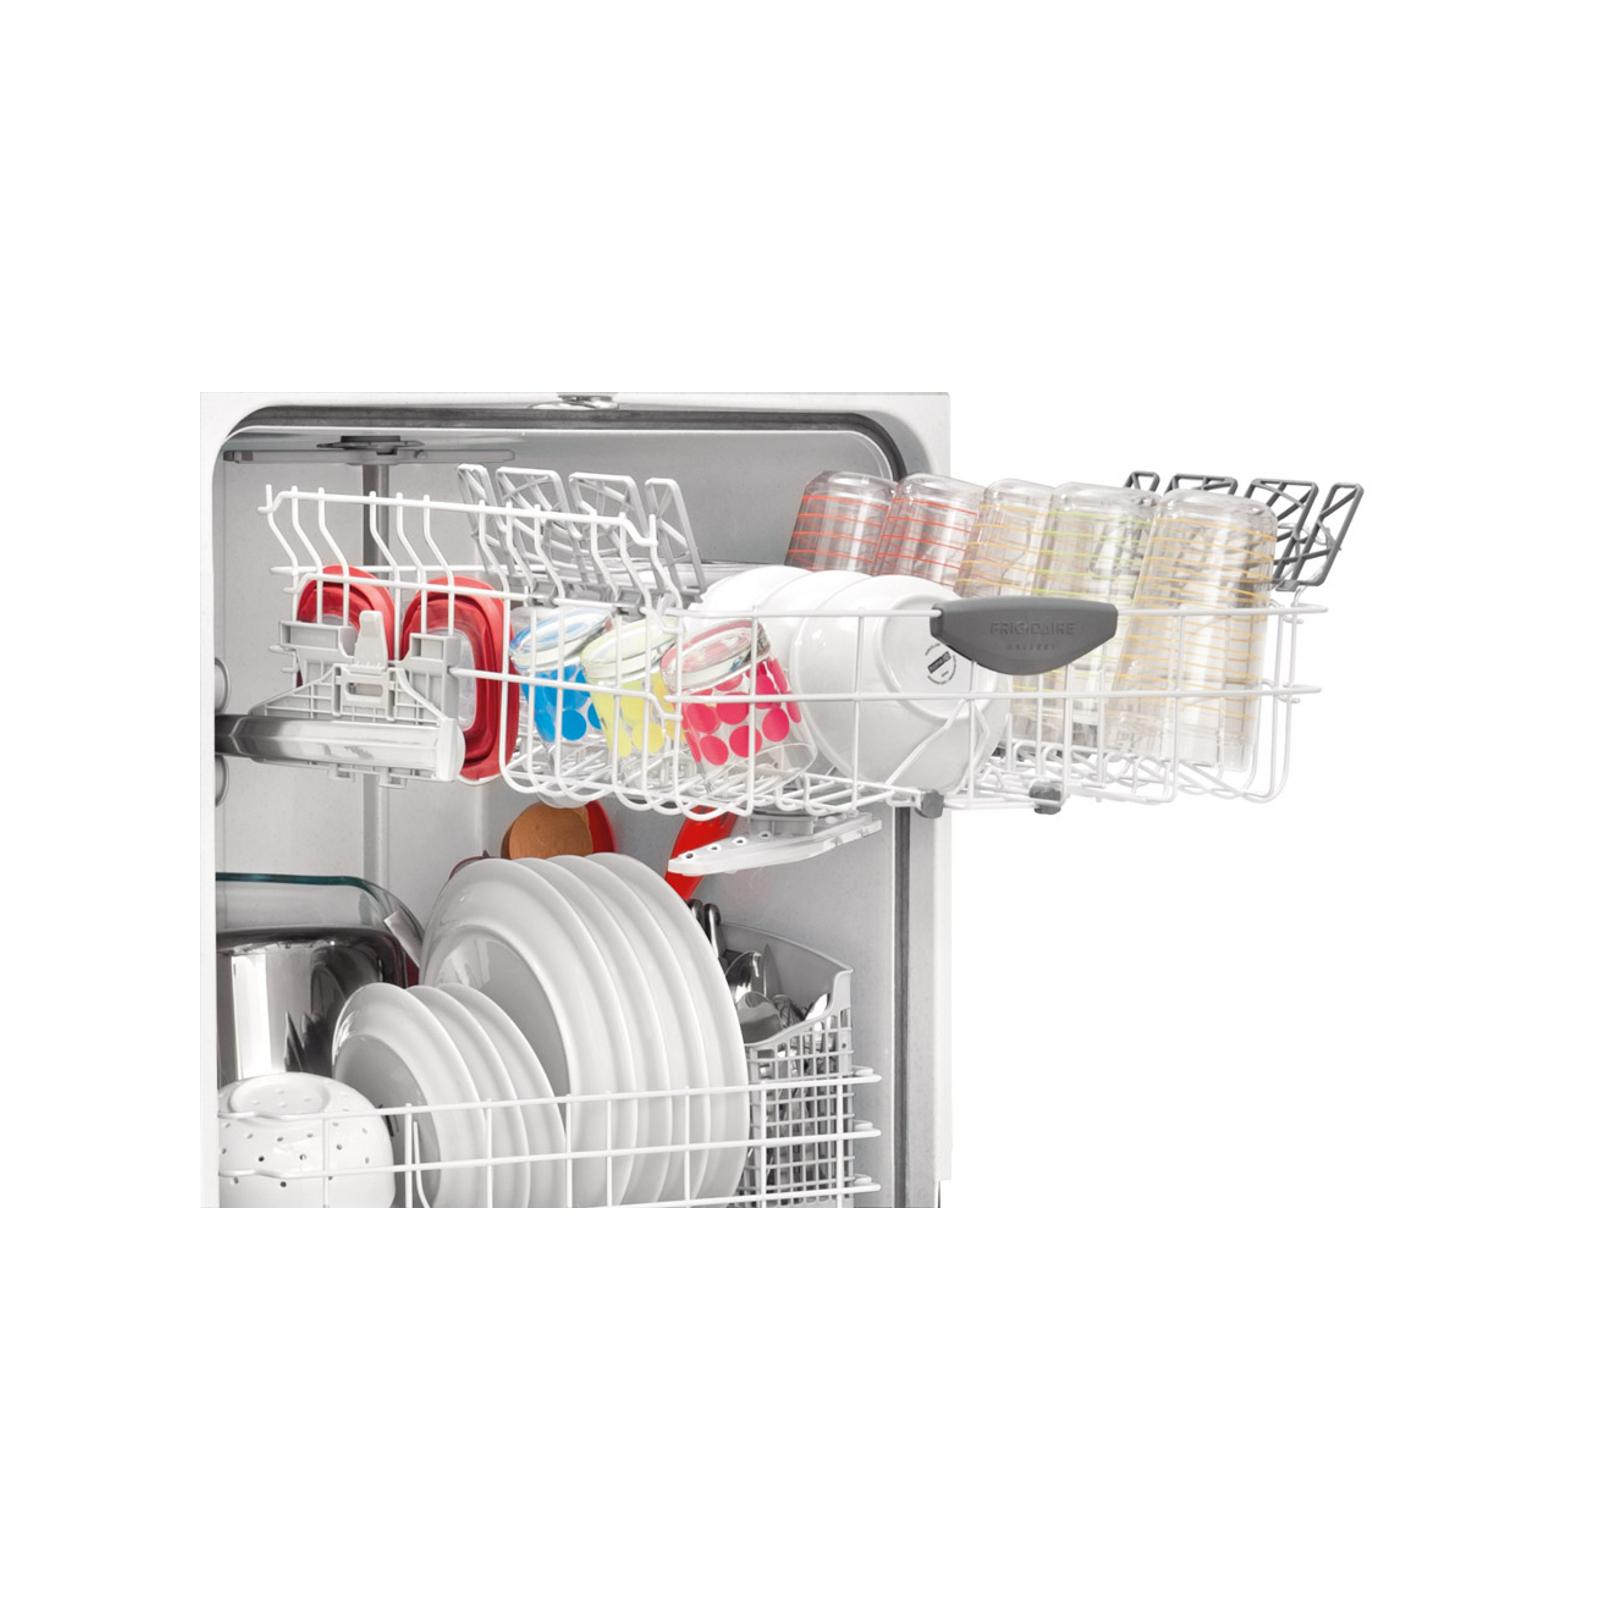 "Frigidaire Gallery Gallery 24"" Built-In Dishwasher w/ Nylon Racks - Stainless Steel"